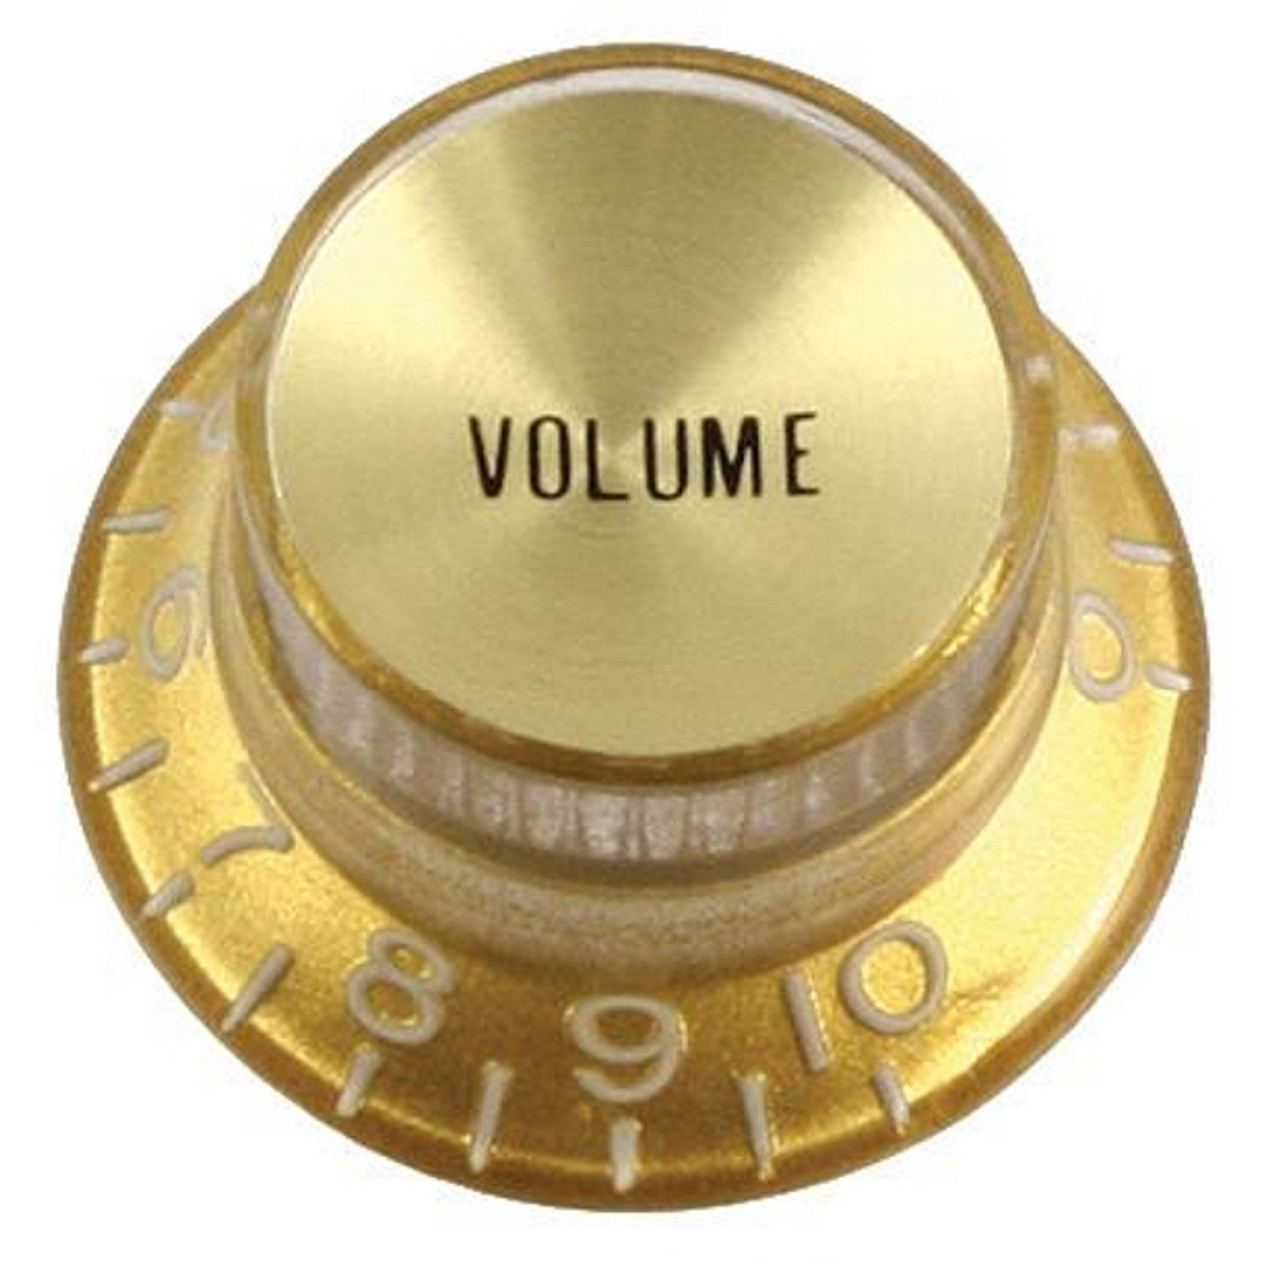 Reflector Cap Volume Knob with Fine Splines-Gold